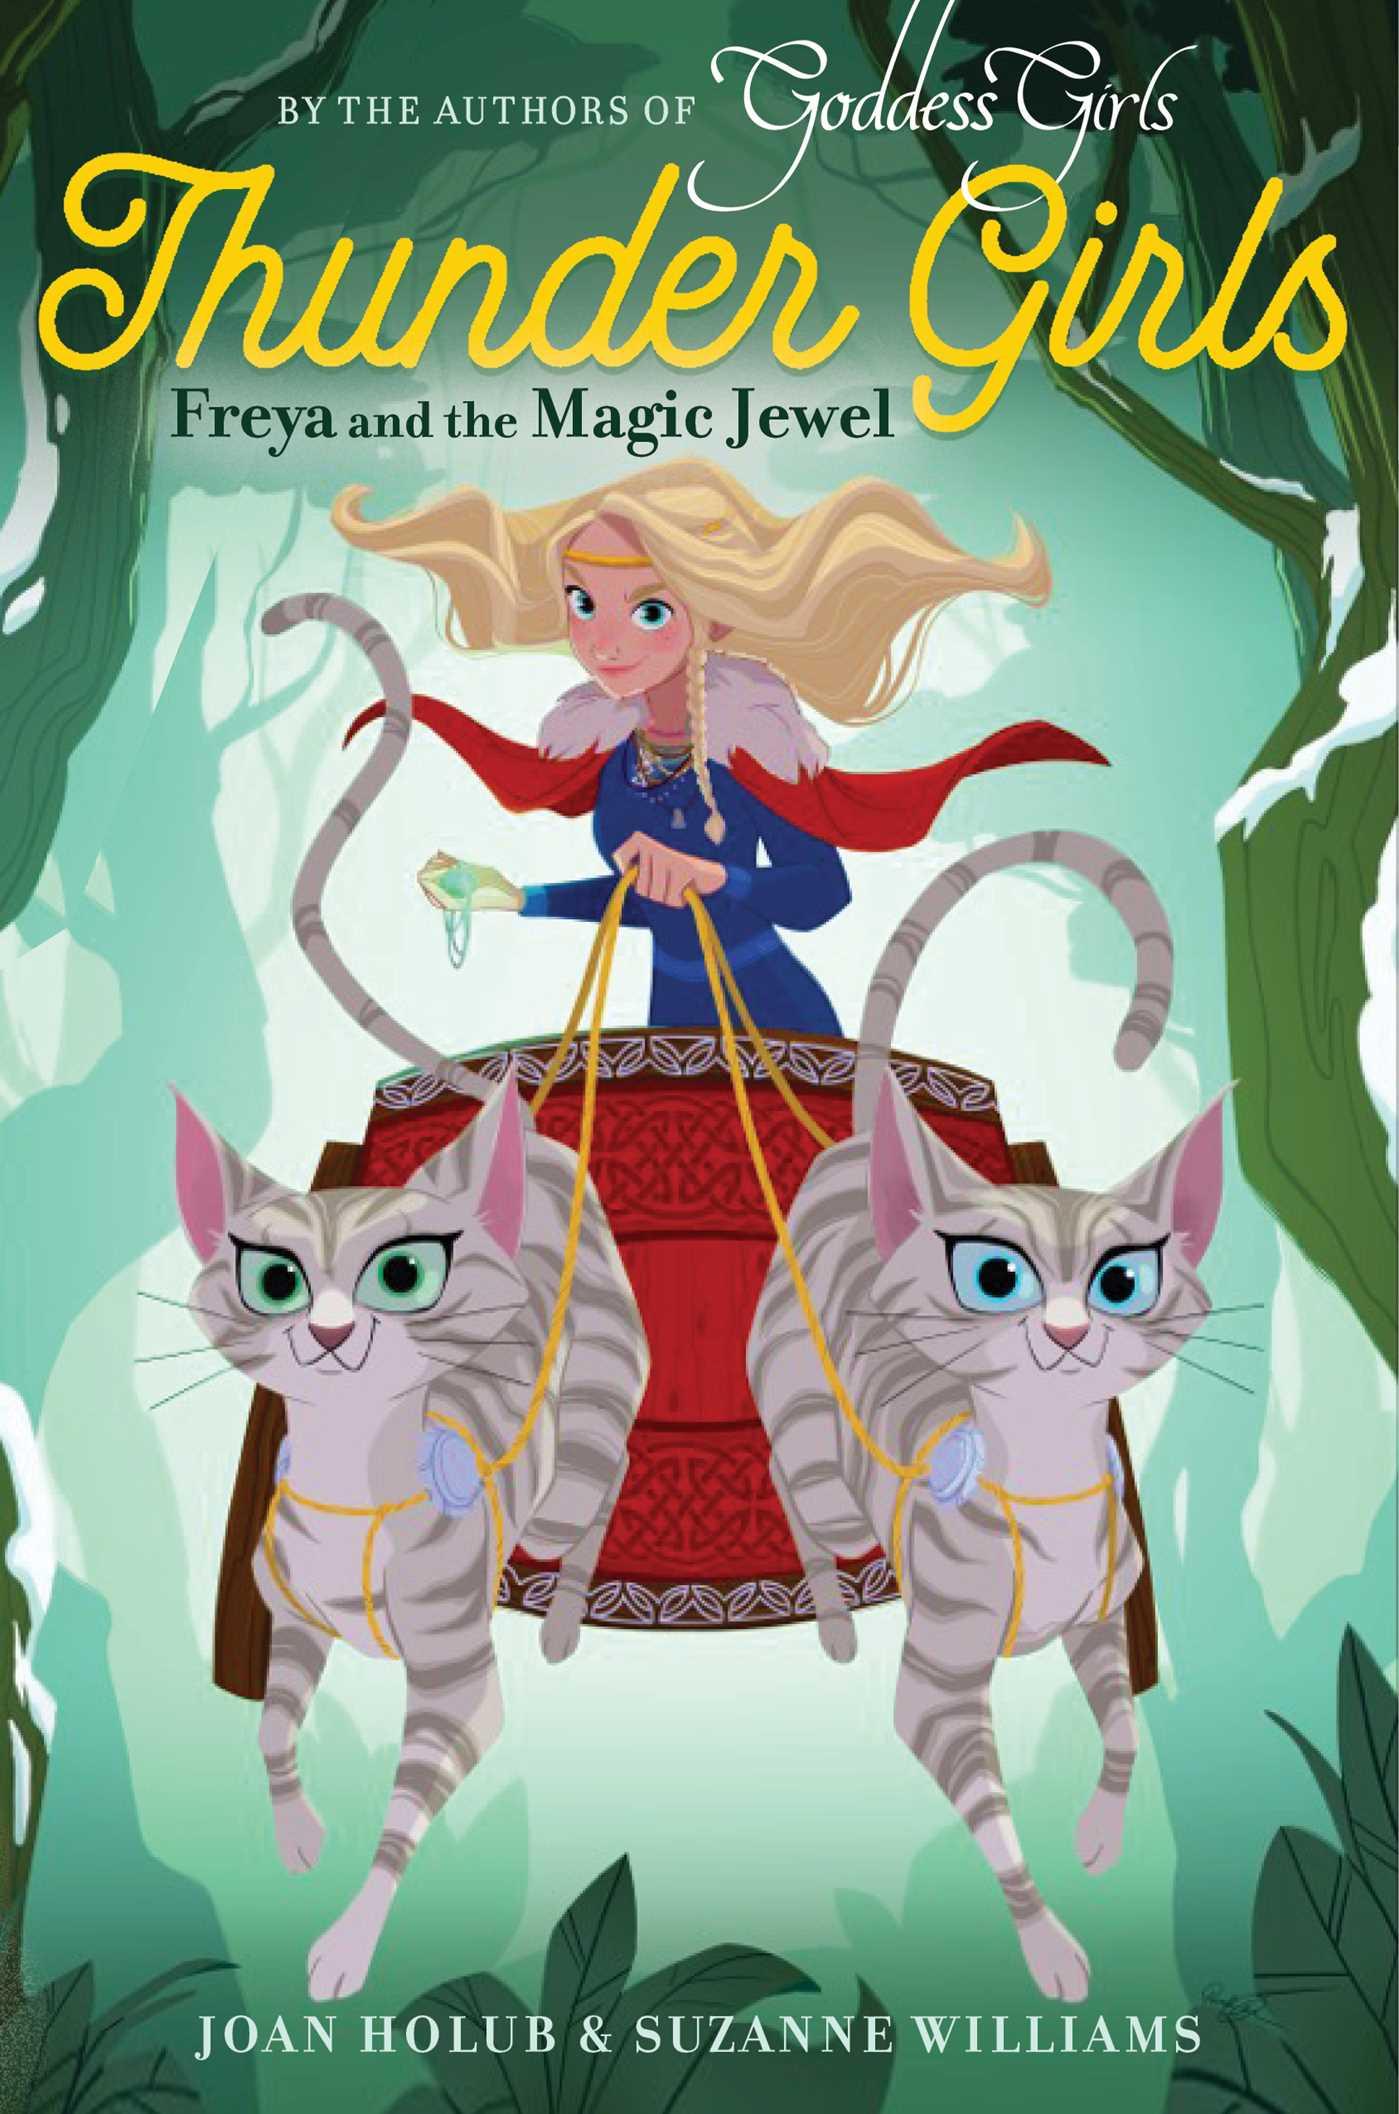 Freya and the magic jewel 9781481496407 hr